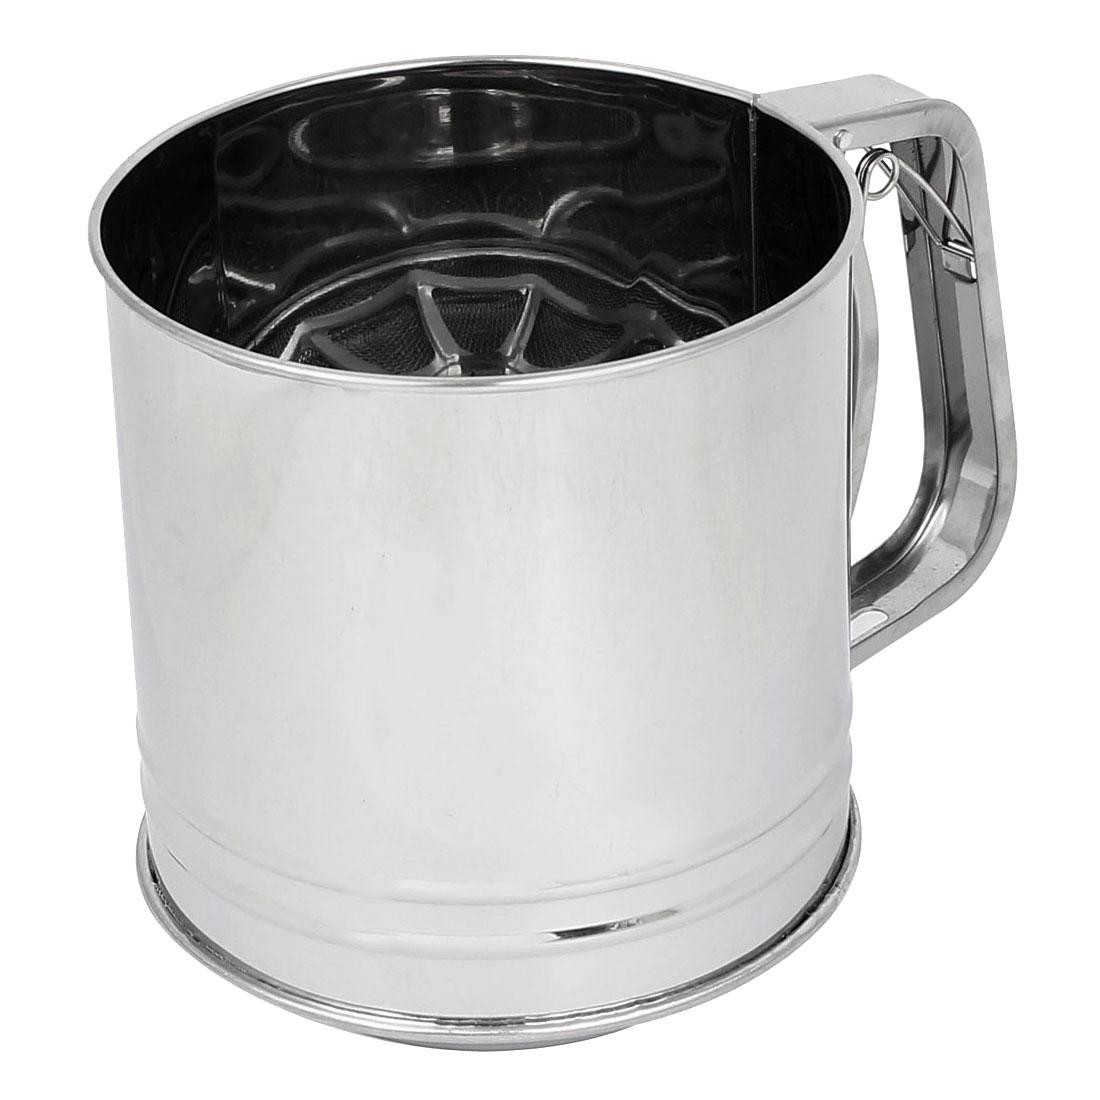 Kitchen Baking Metal Trigger Handle Flour Sugar Mesh Sifter Shaker 1000ml